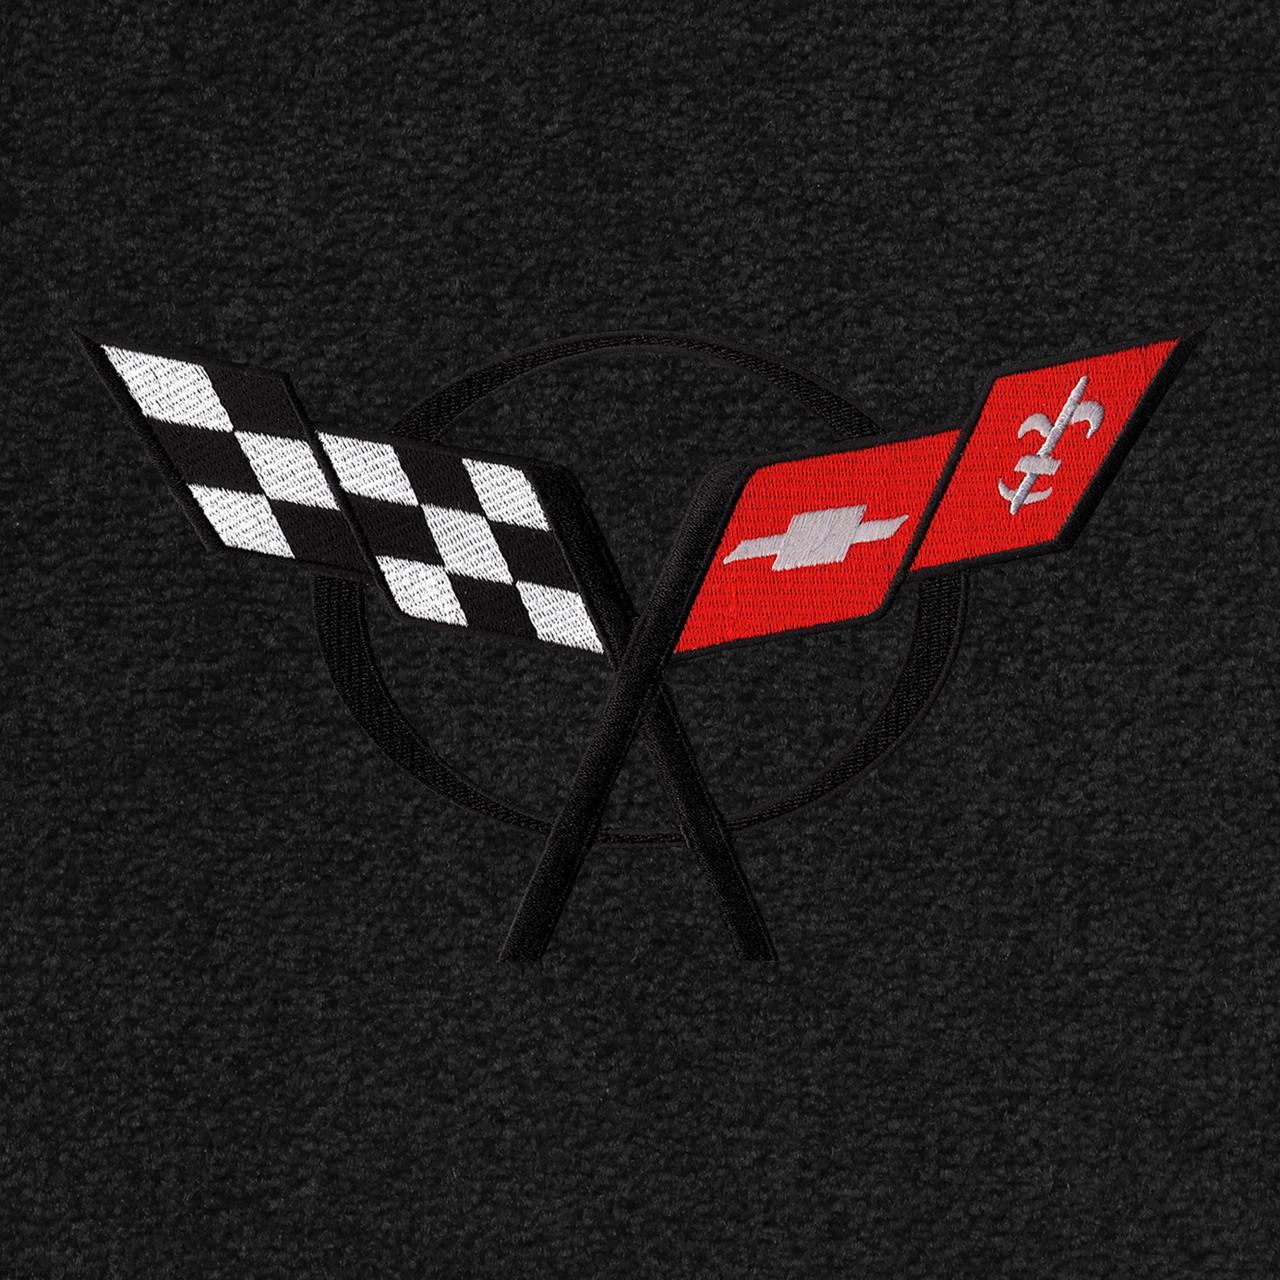 C5 Corvette Logo - Black